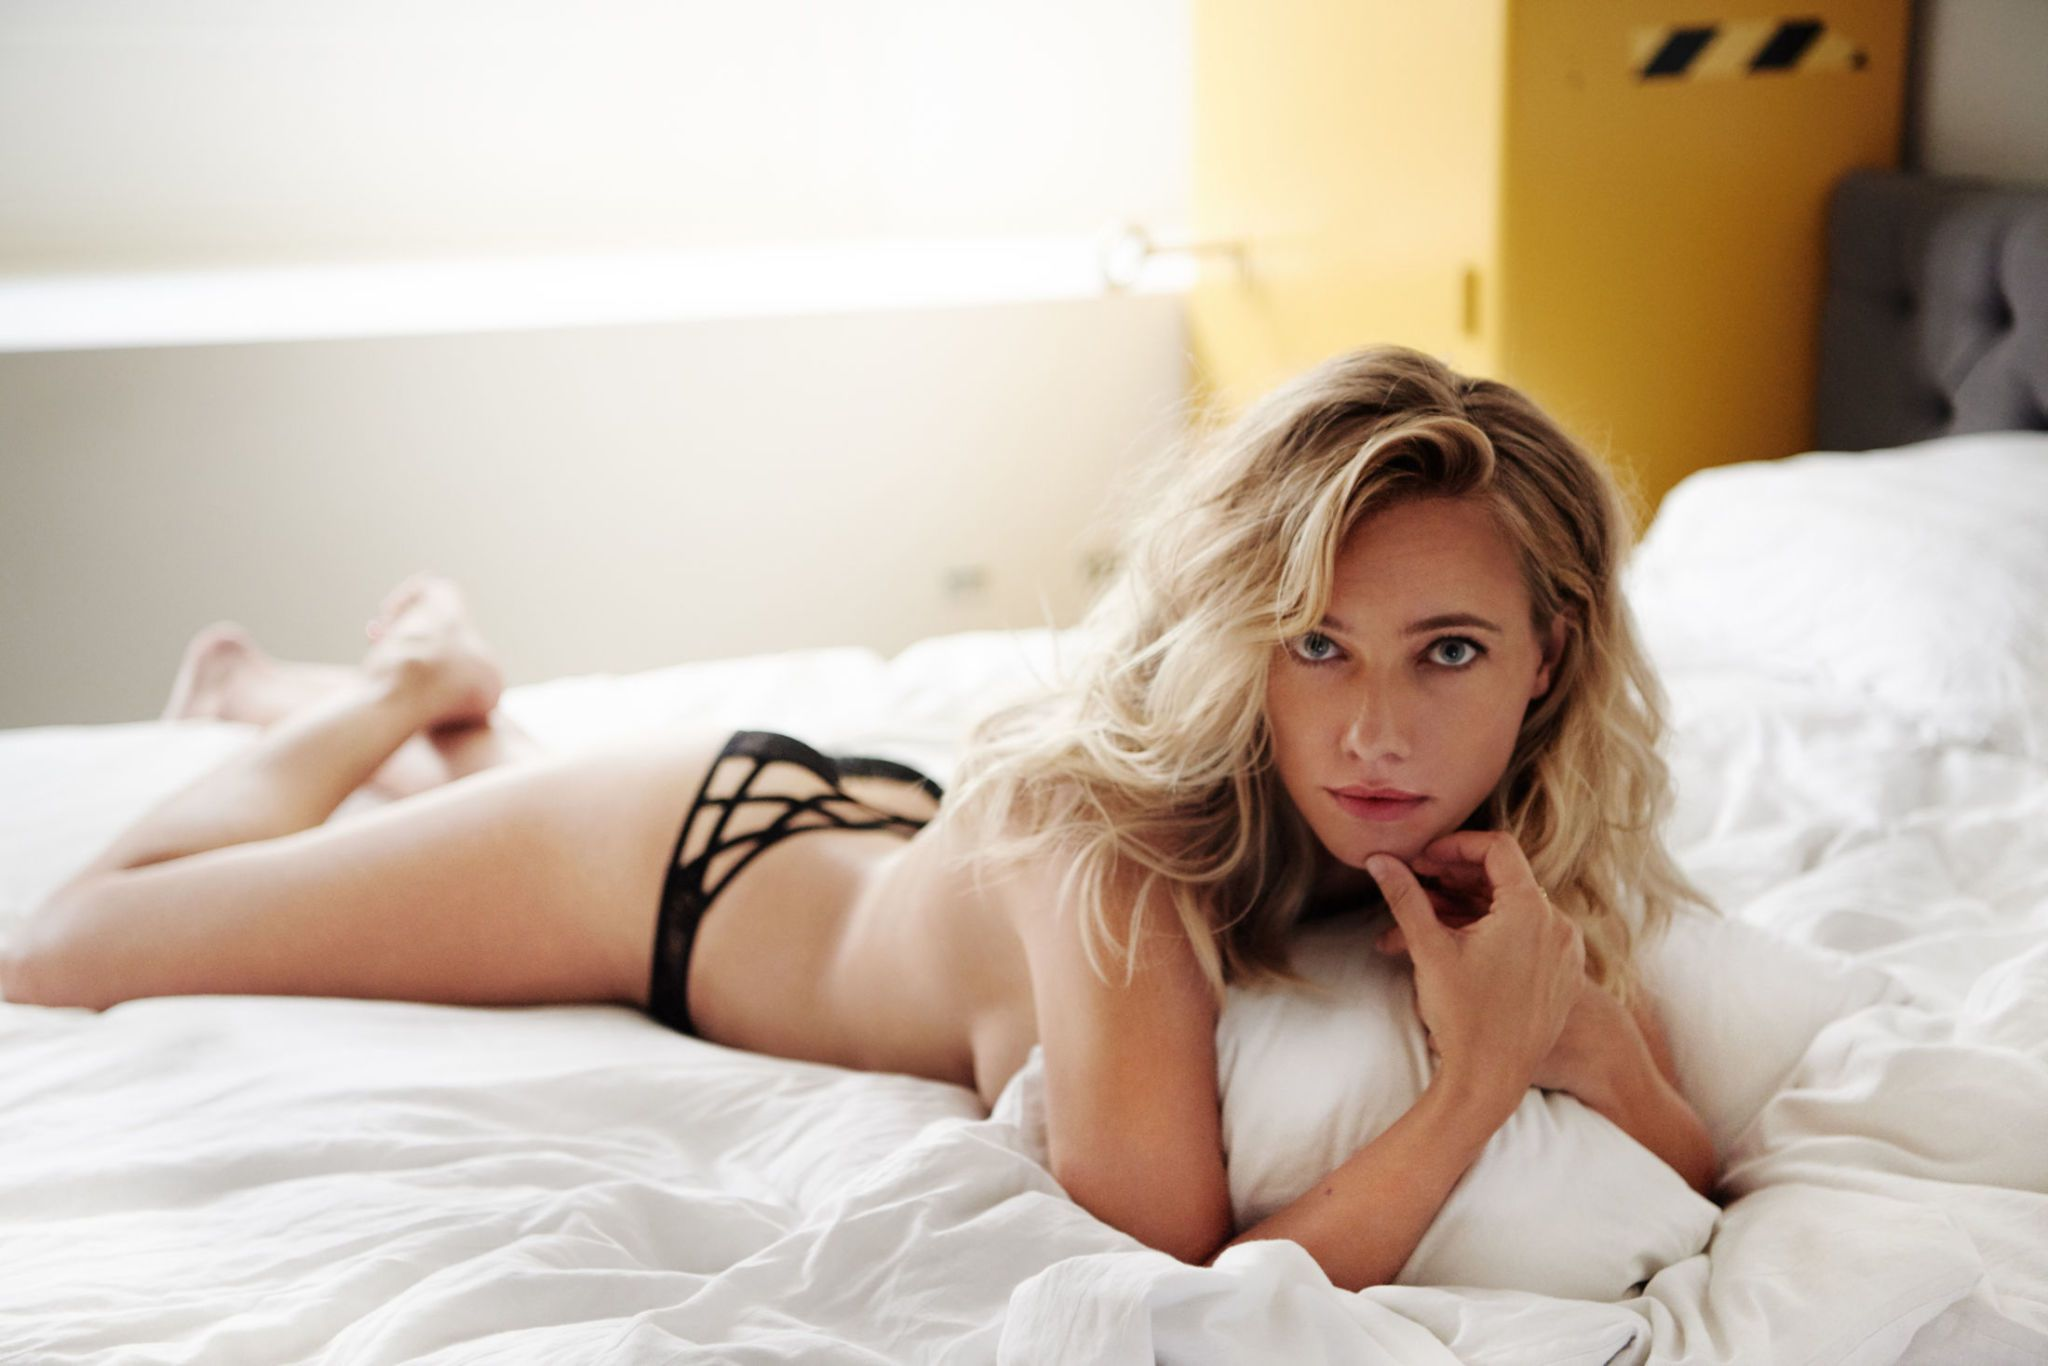 Bikini Jennifer Hoffman nude photos 2019